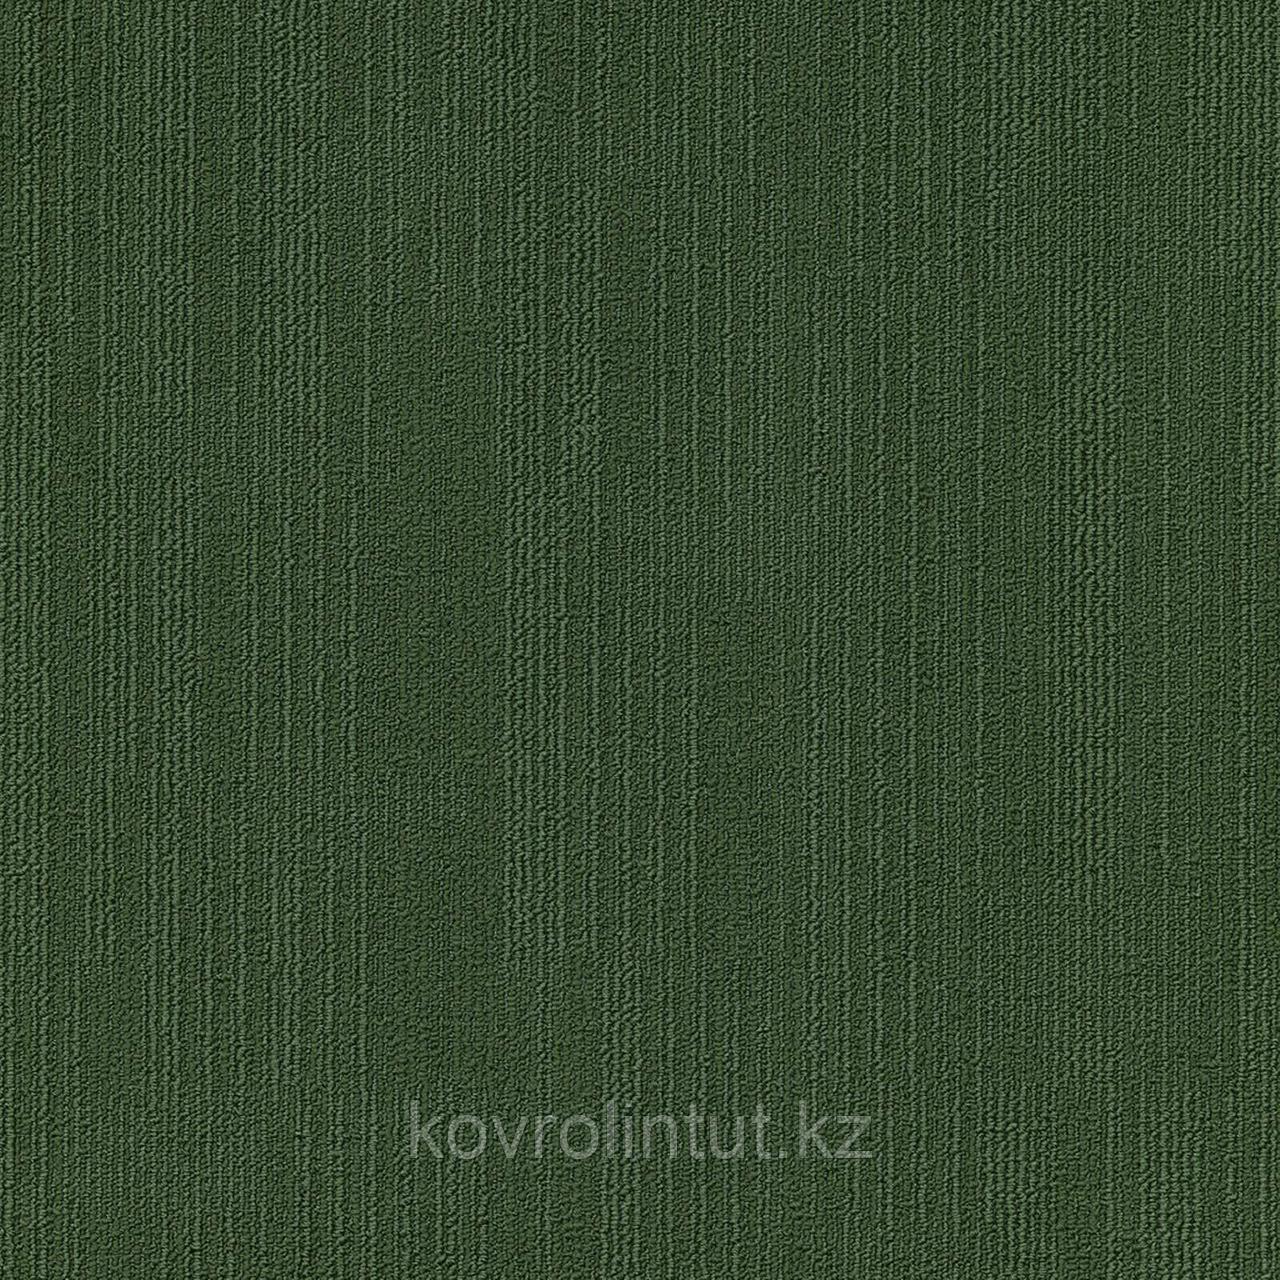 Плитка ковровая Modulyss Fashion 699, 100% PA